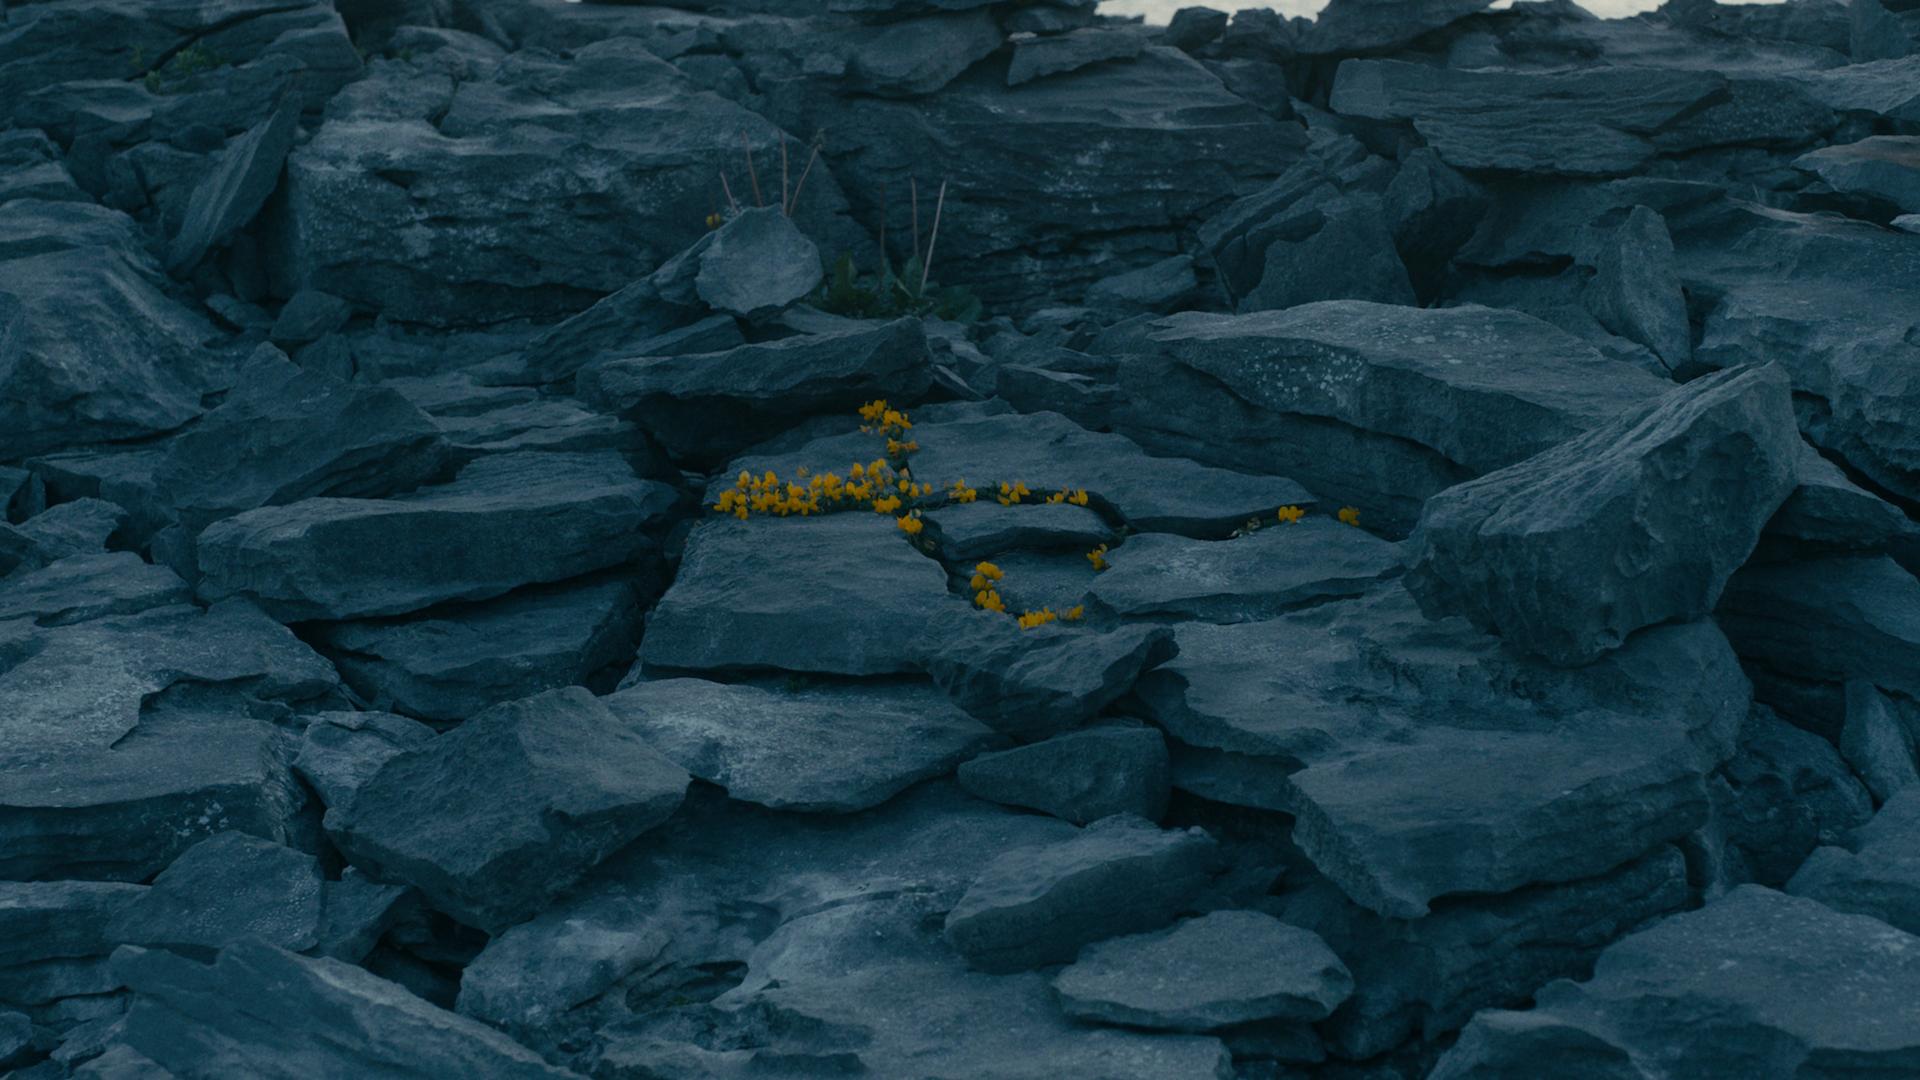 KYLE MACFADZEAN - Screen+Shot+2018-08-25+at+11.41.39